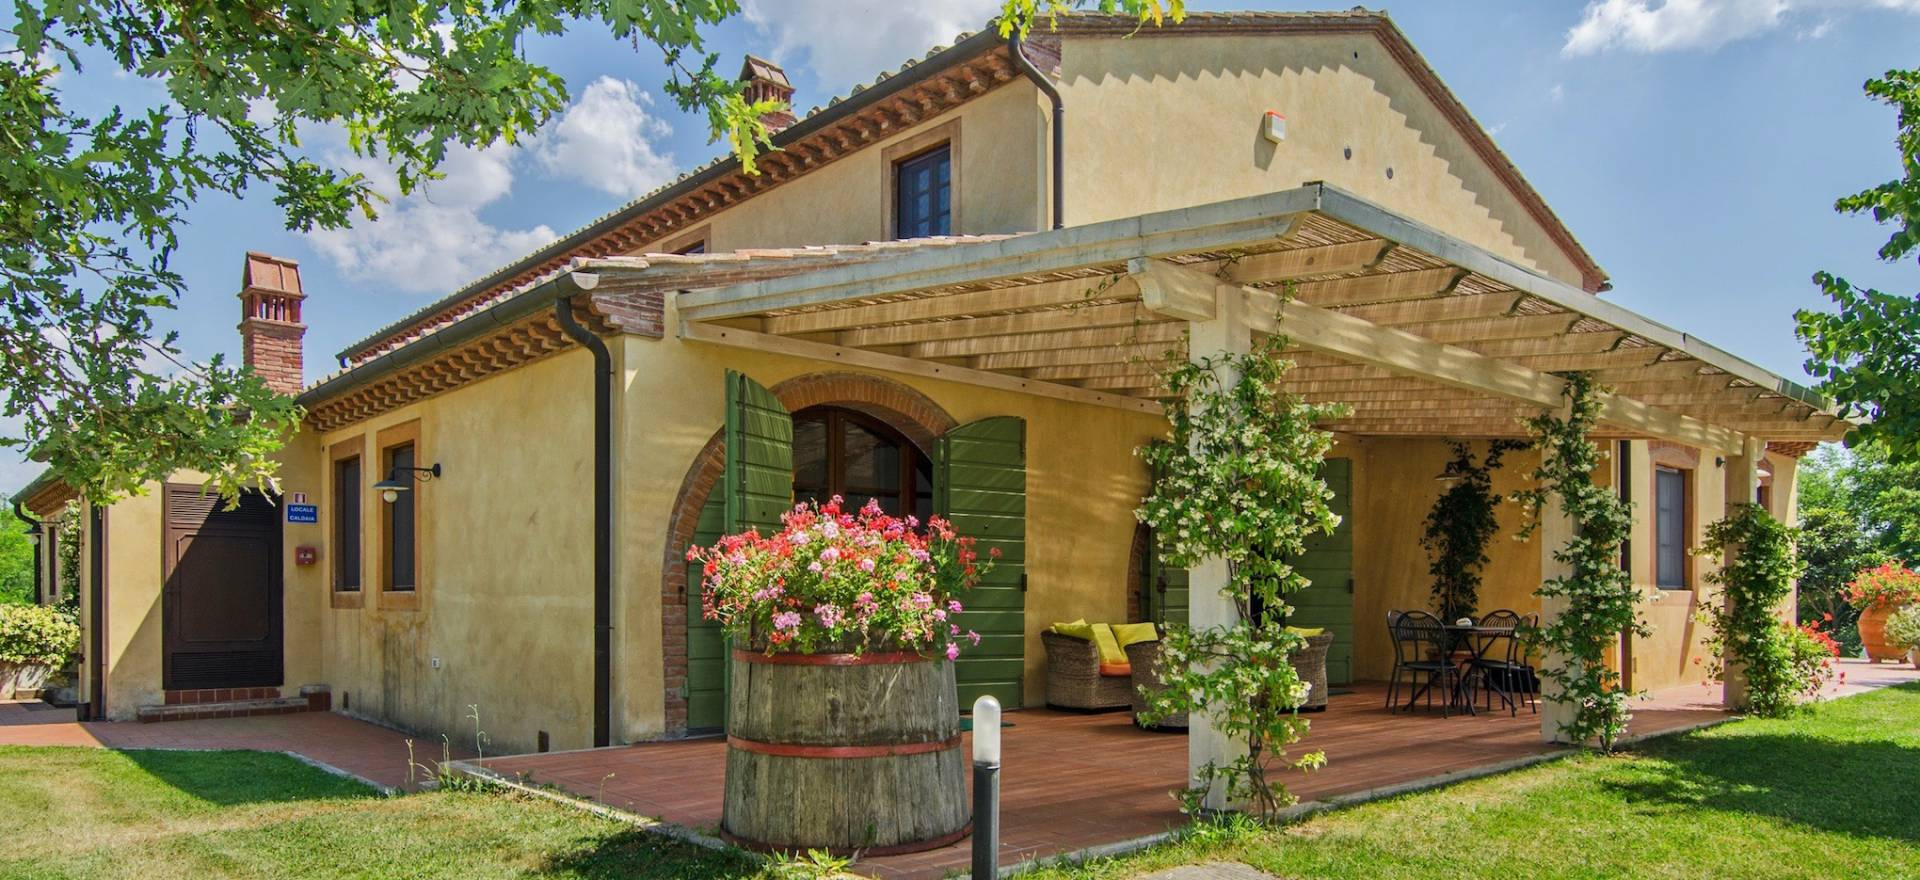 Agriturismo Toscana Agriturismo con piscina panoramica in Toscana